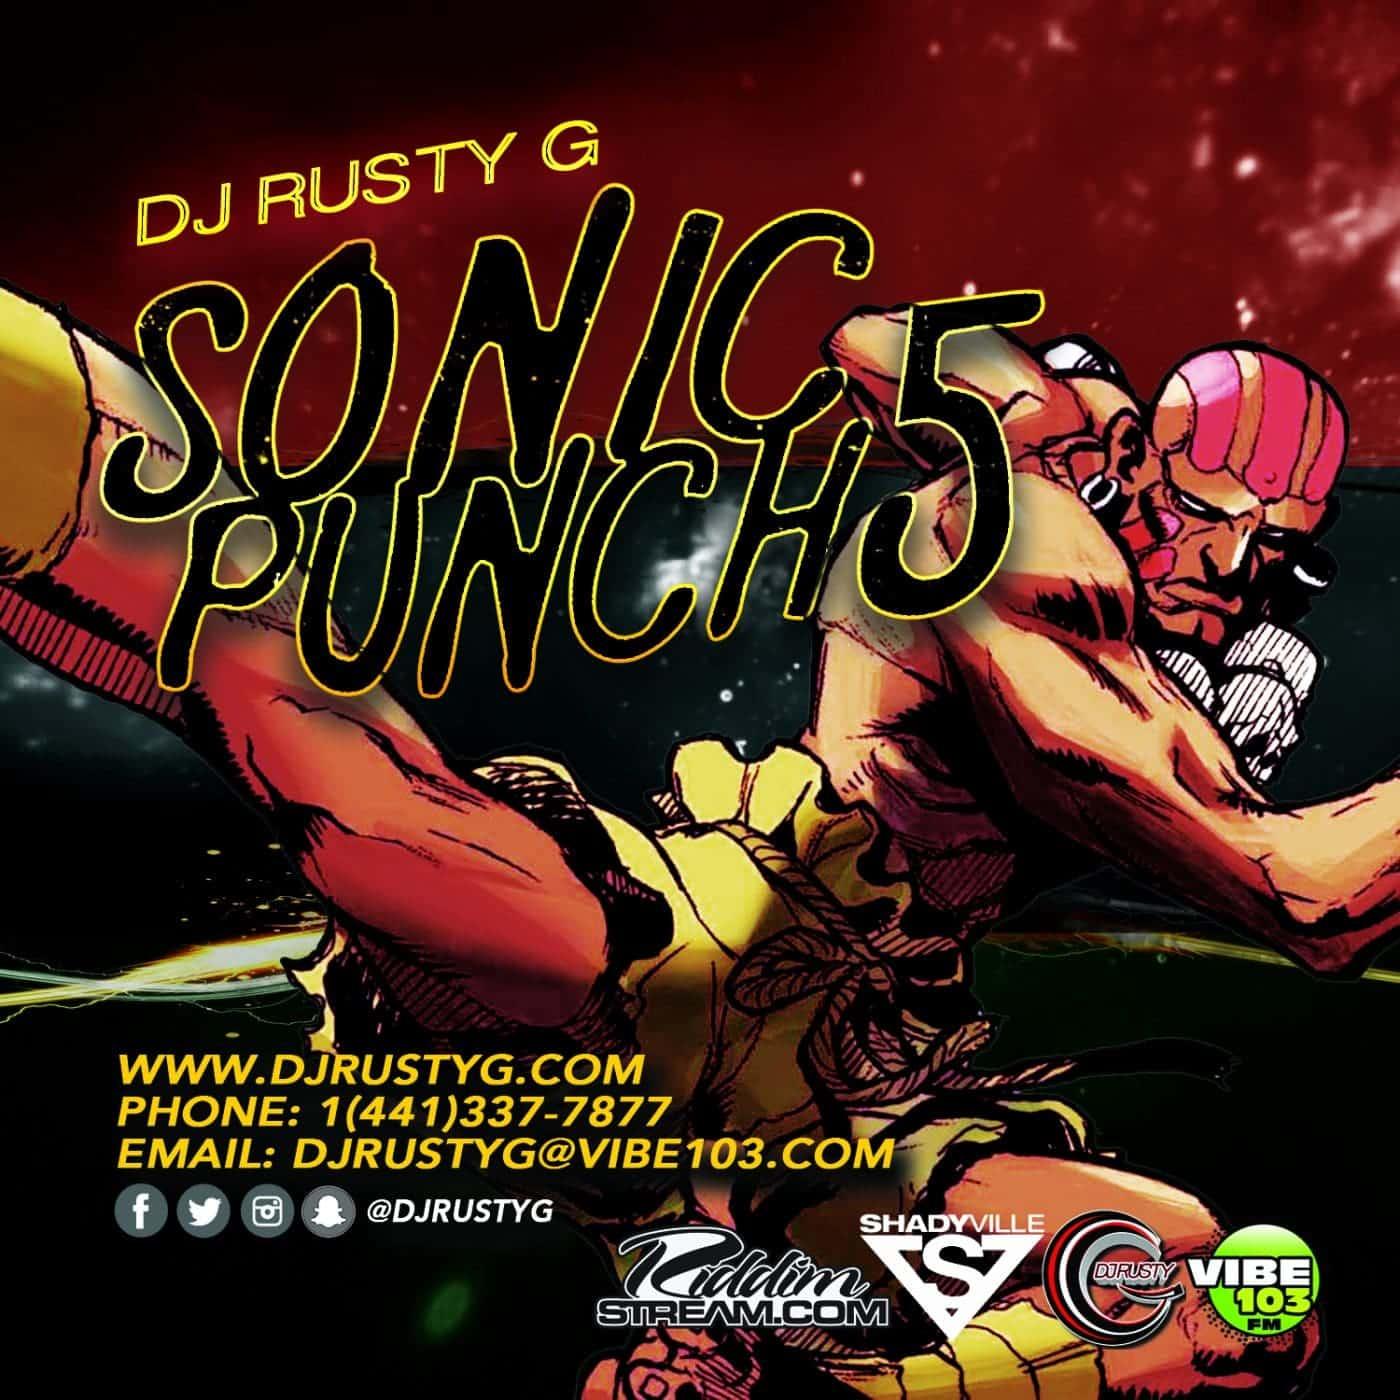 Dj Rusty G - Sonic Punch 5